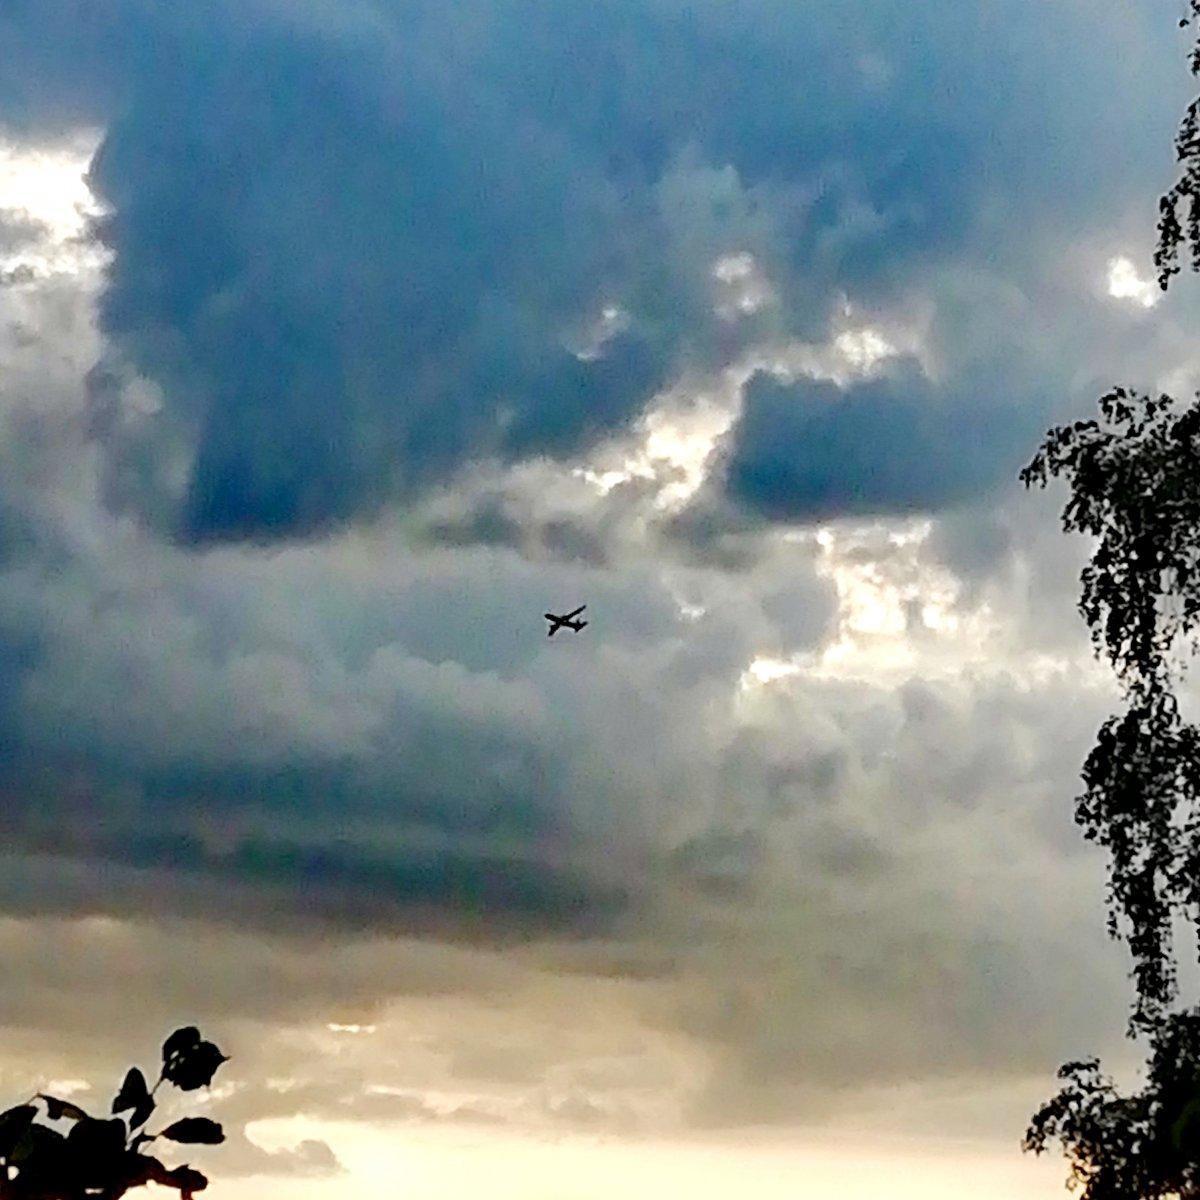 Тишково. Самолёты улетают... Тают в облаках.